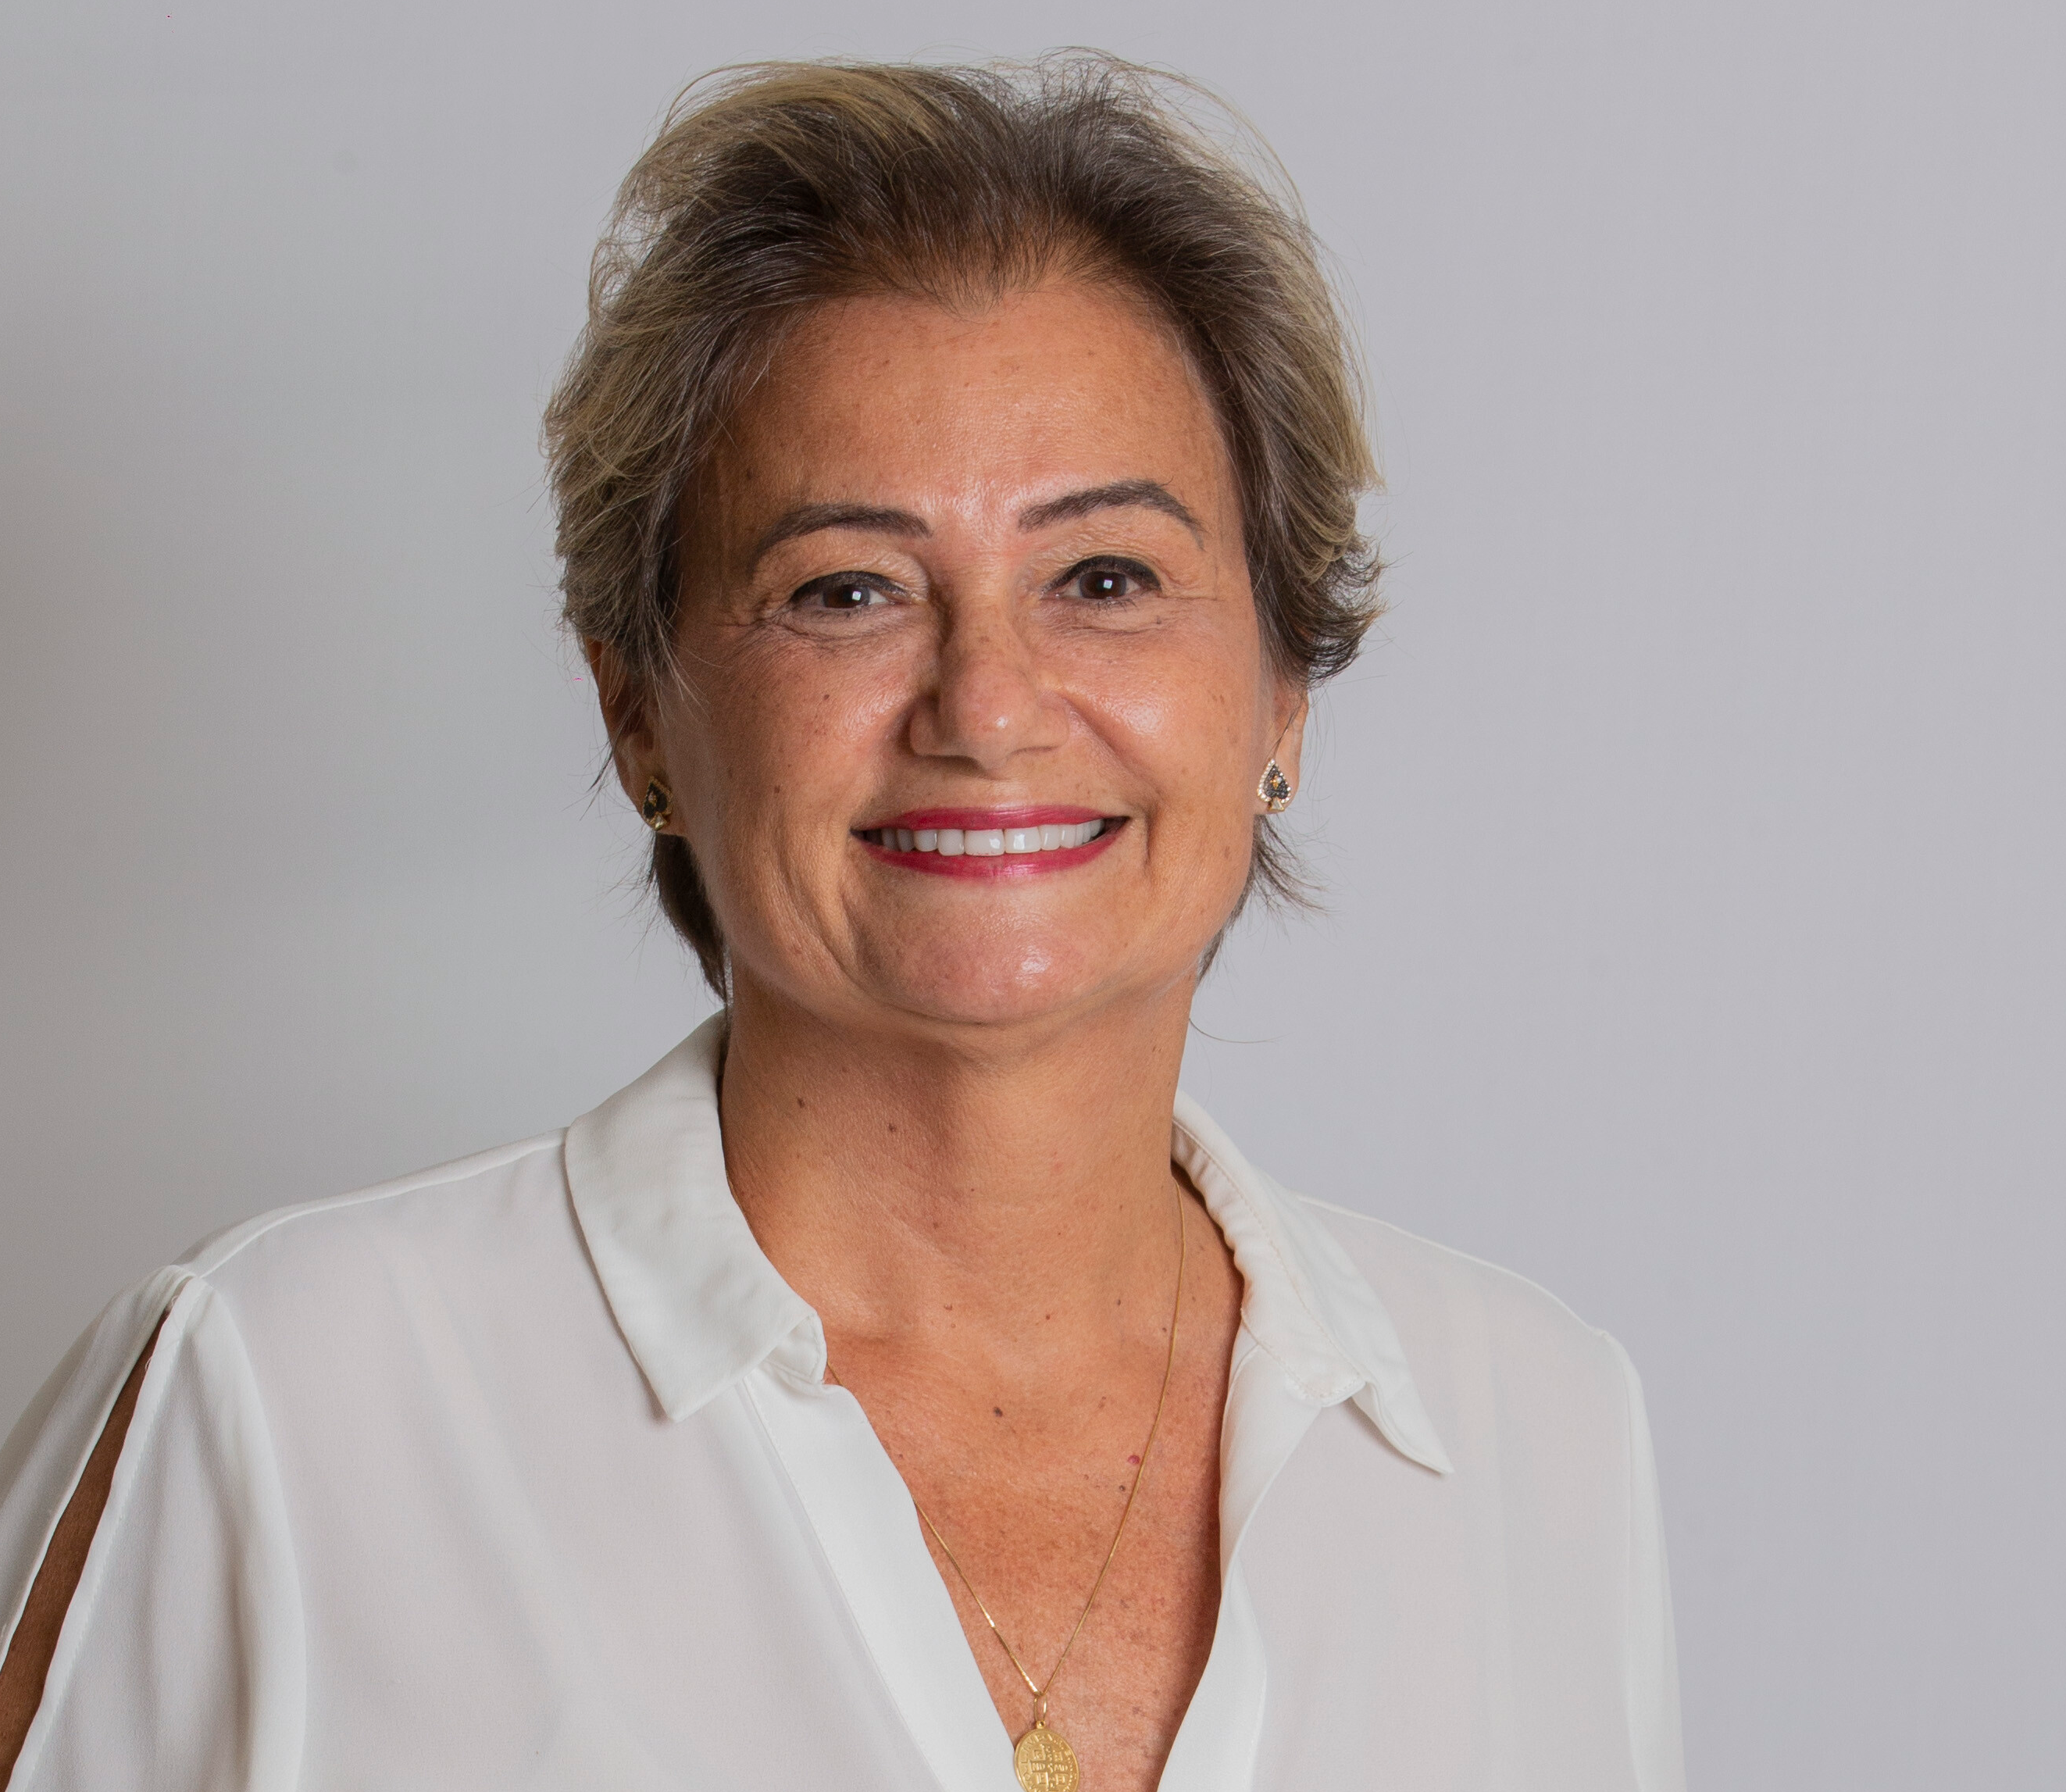 Sheila Teles